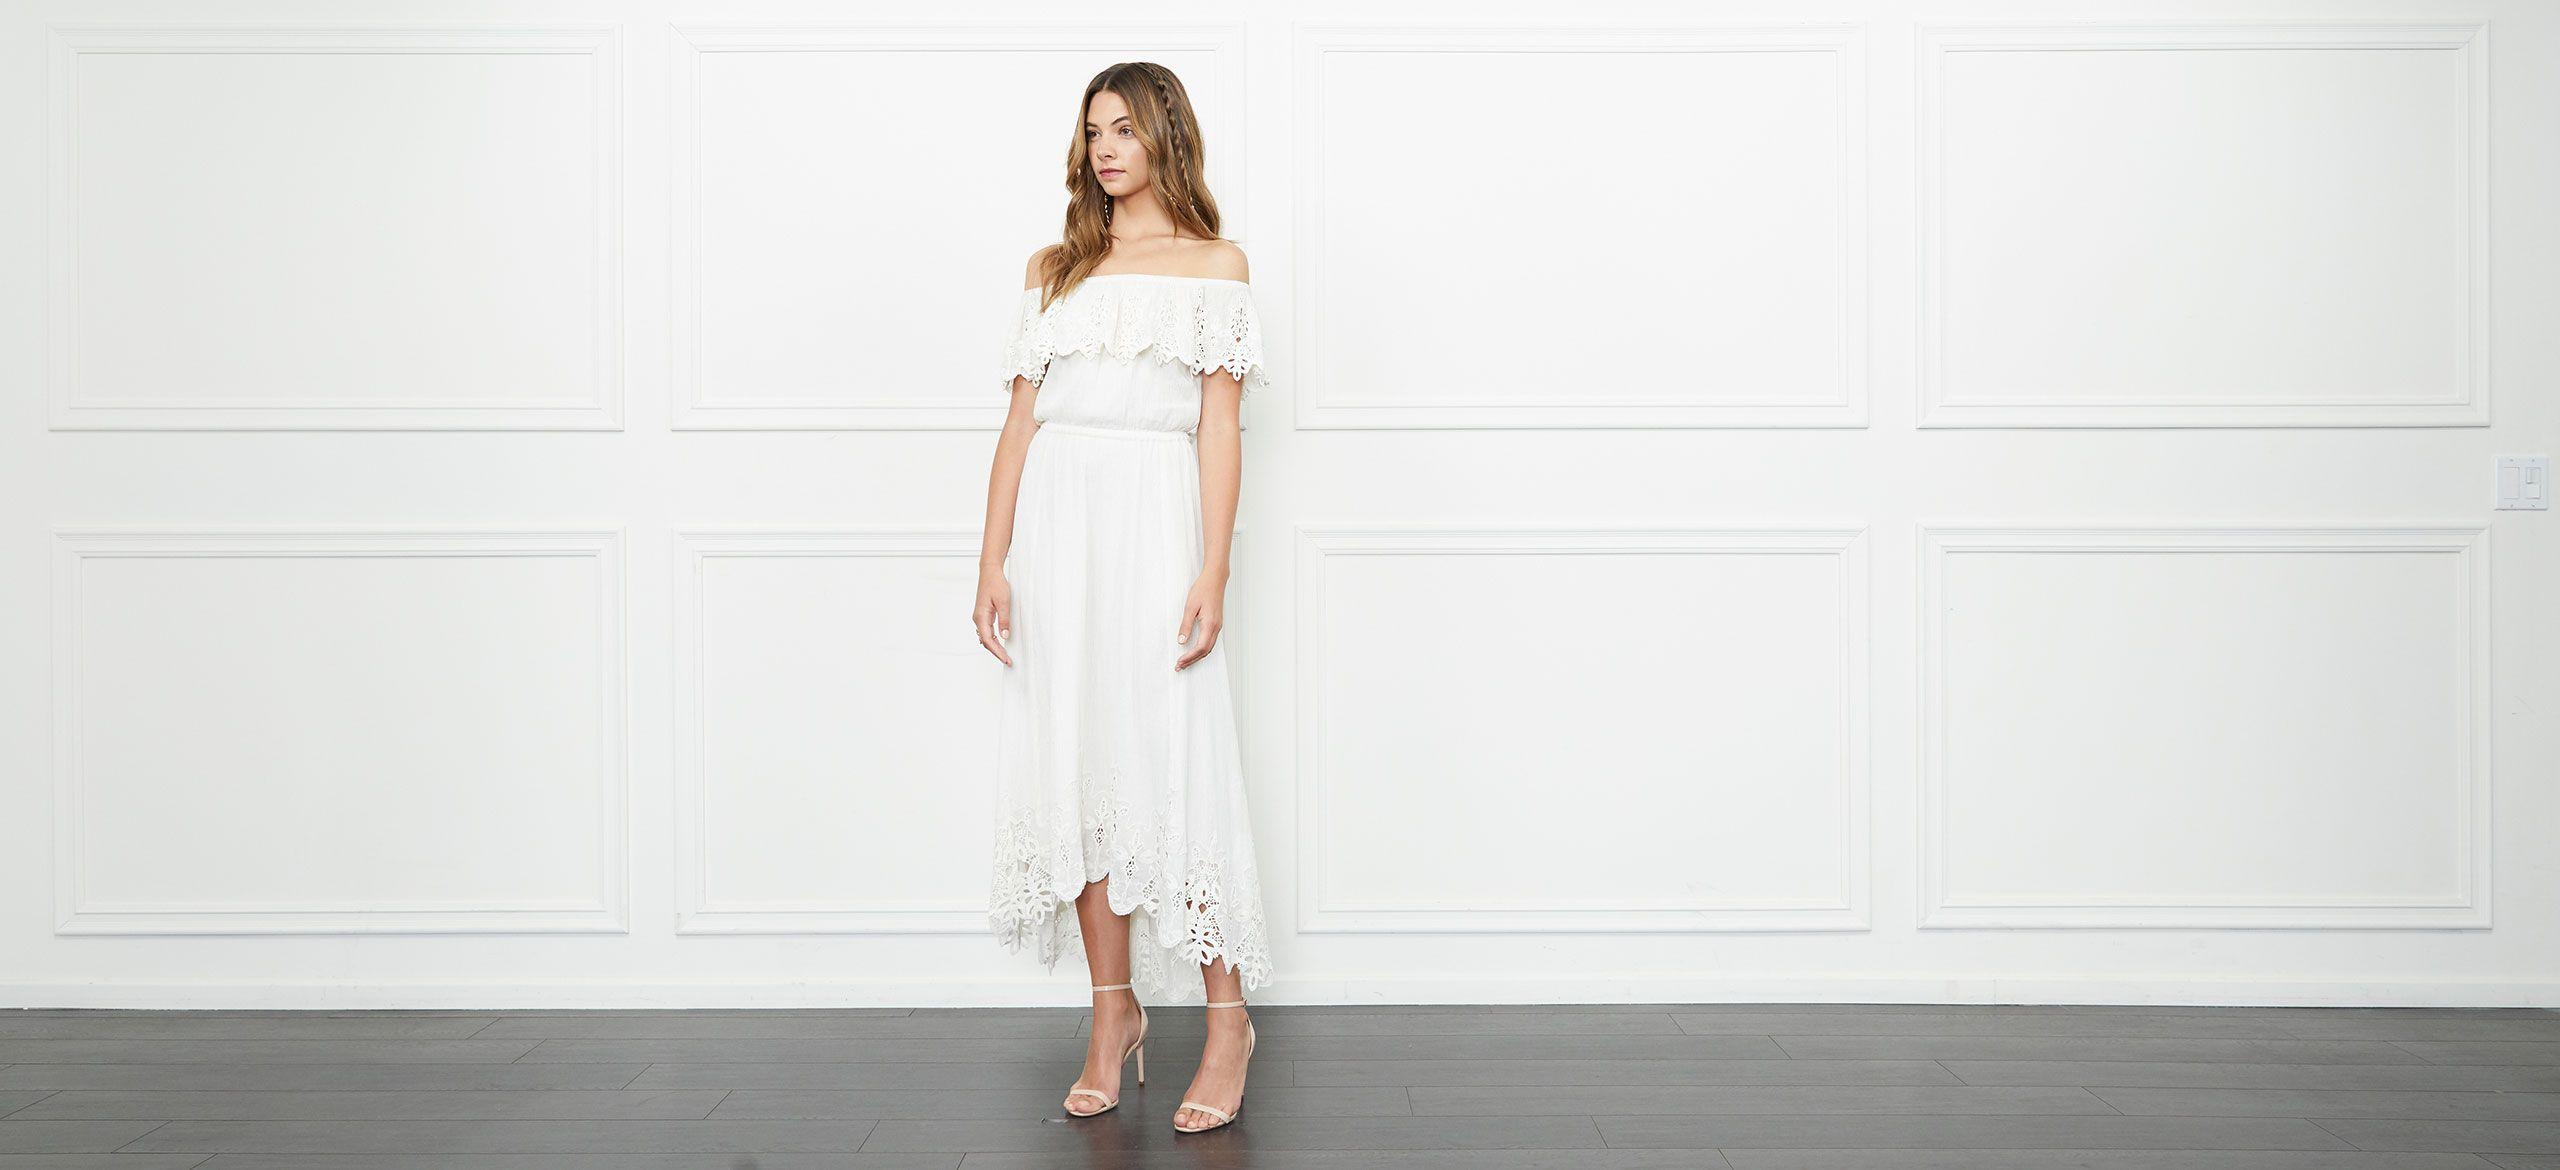 Rachel zoe halsey offtheshoulder eyeletdetail highlow dress